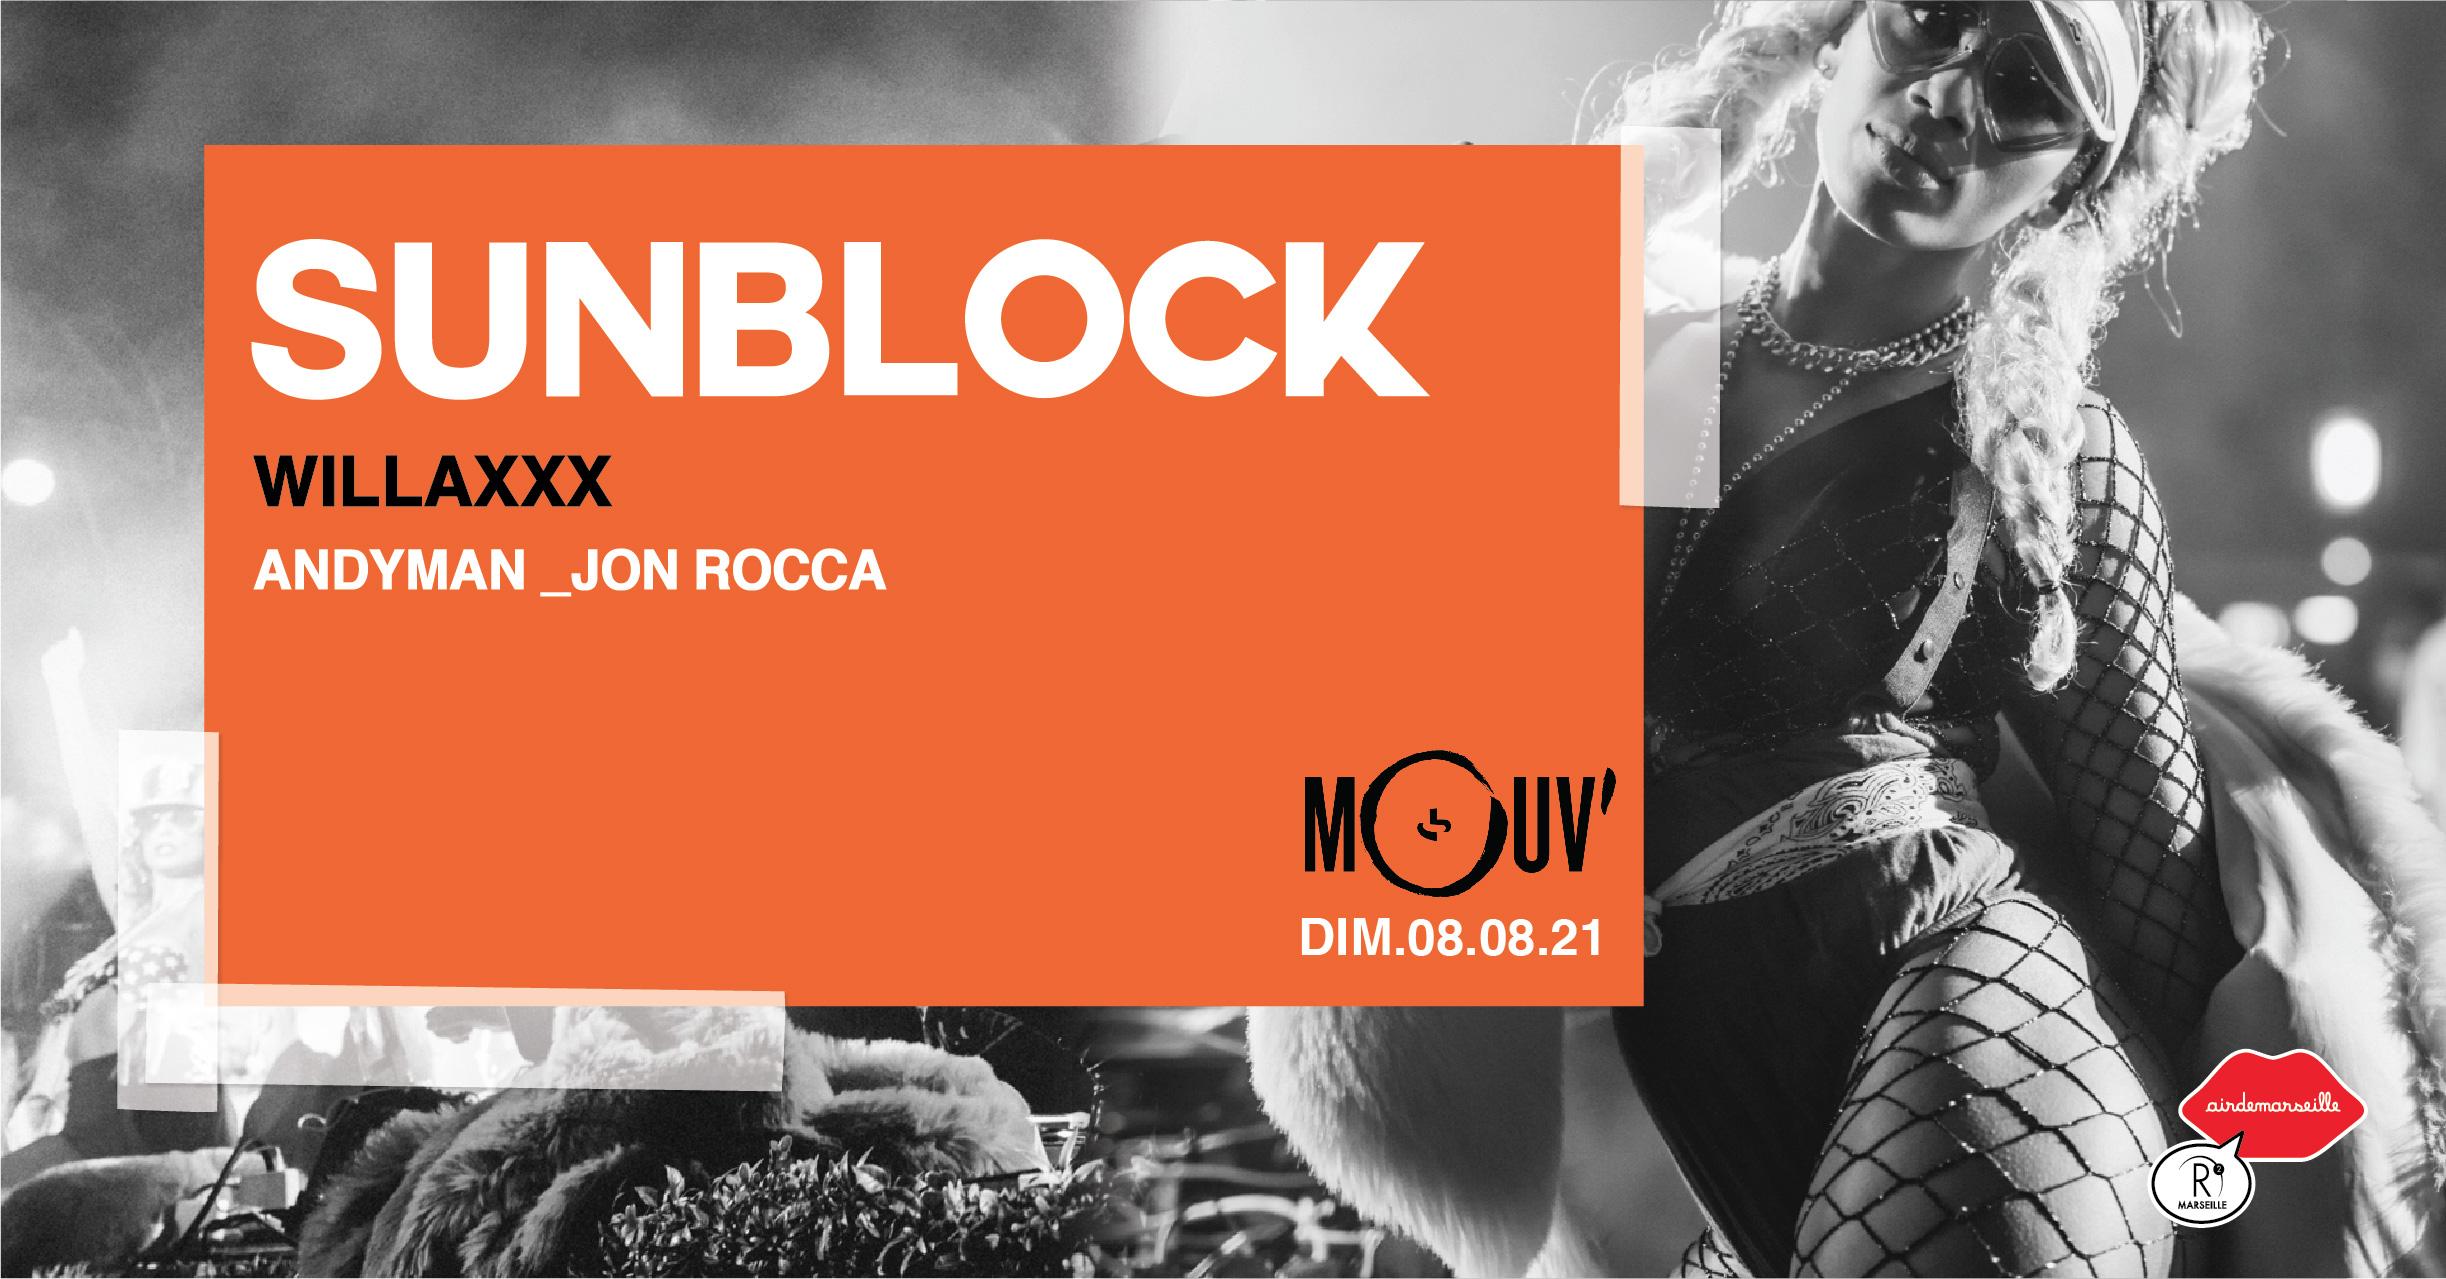 SUNBLOCK X RADIO MOUV' - WILLAXXX & GUEST